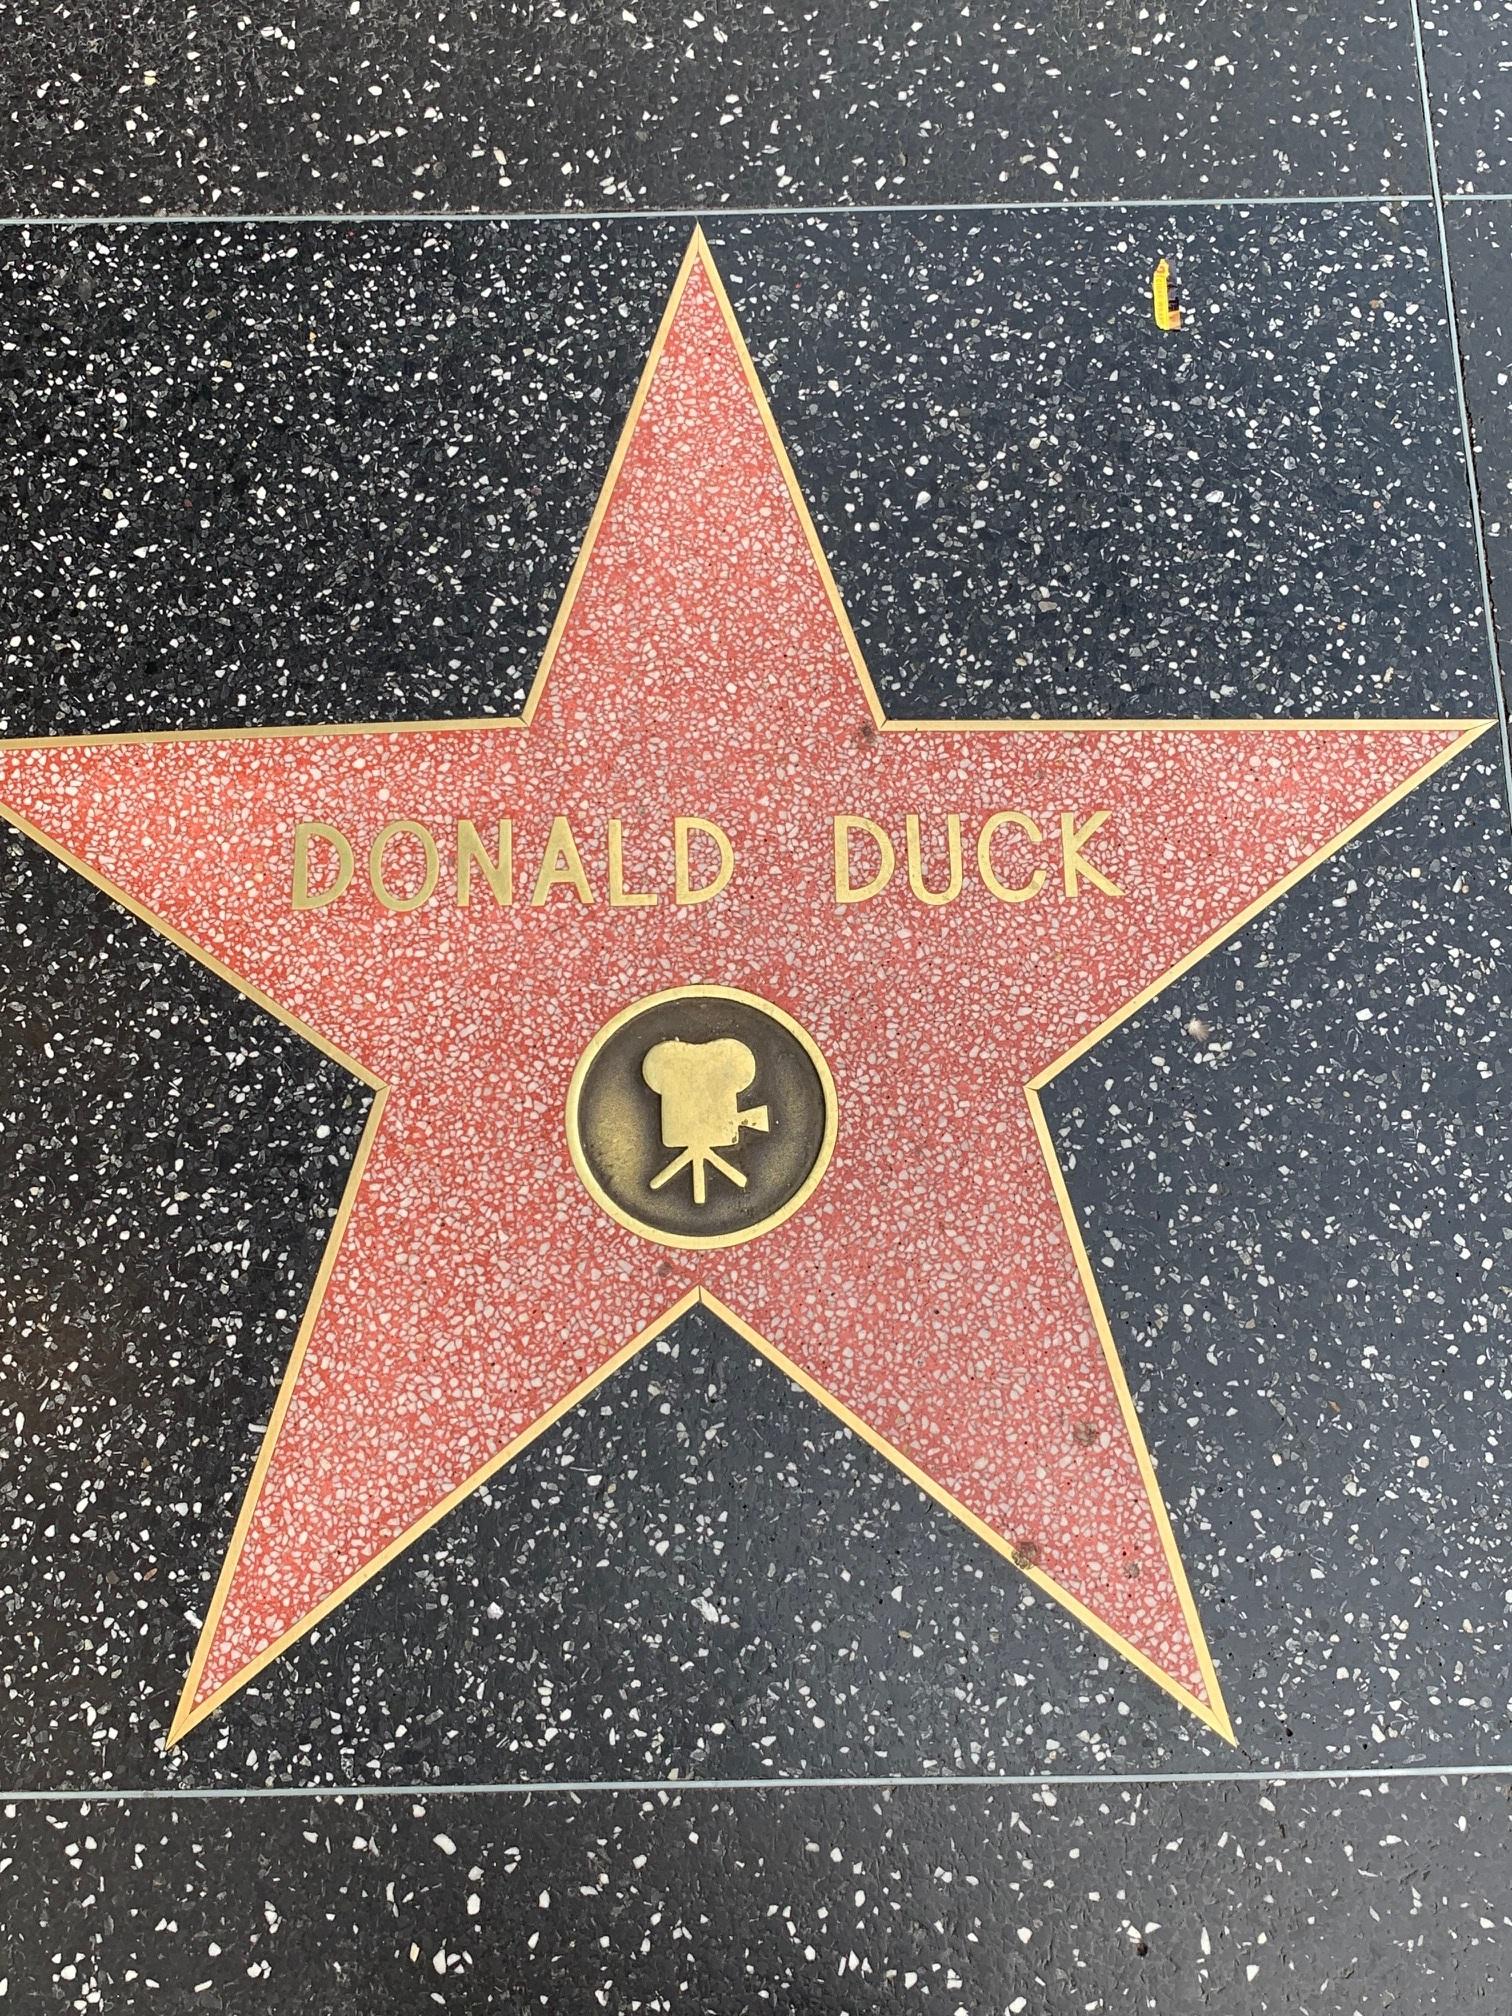 Donald Duck star